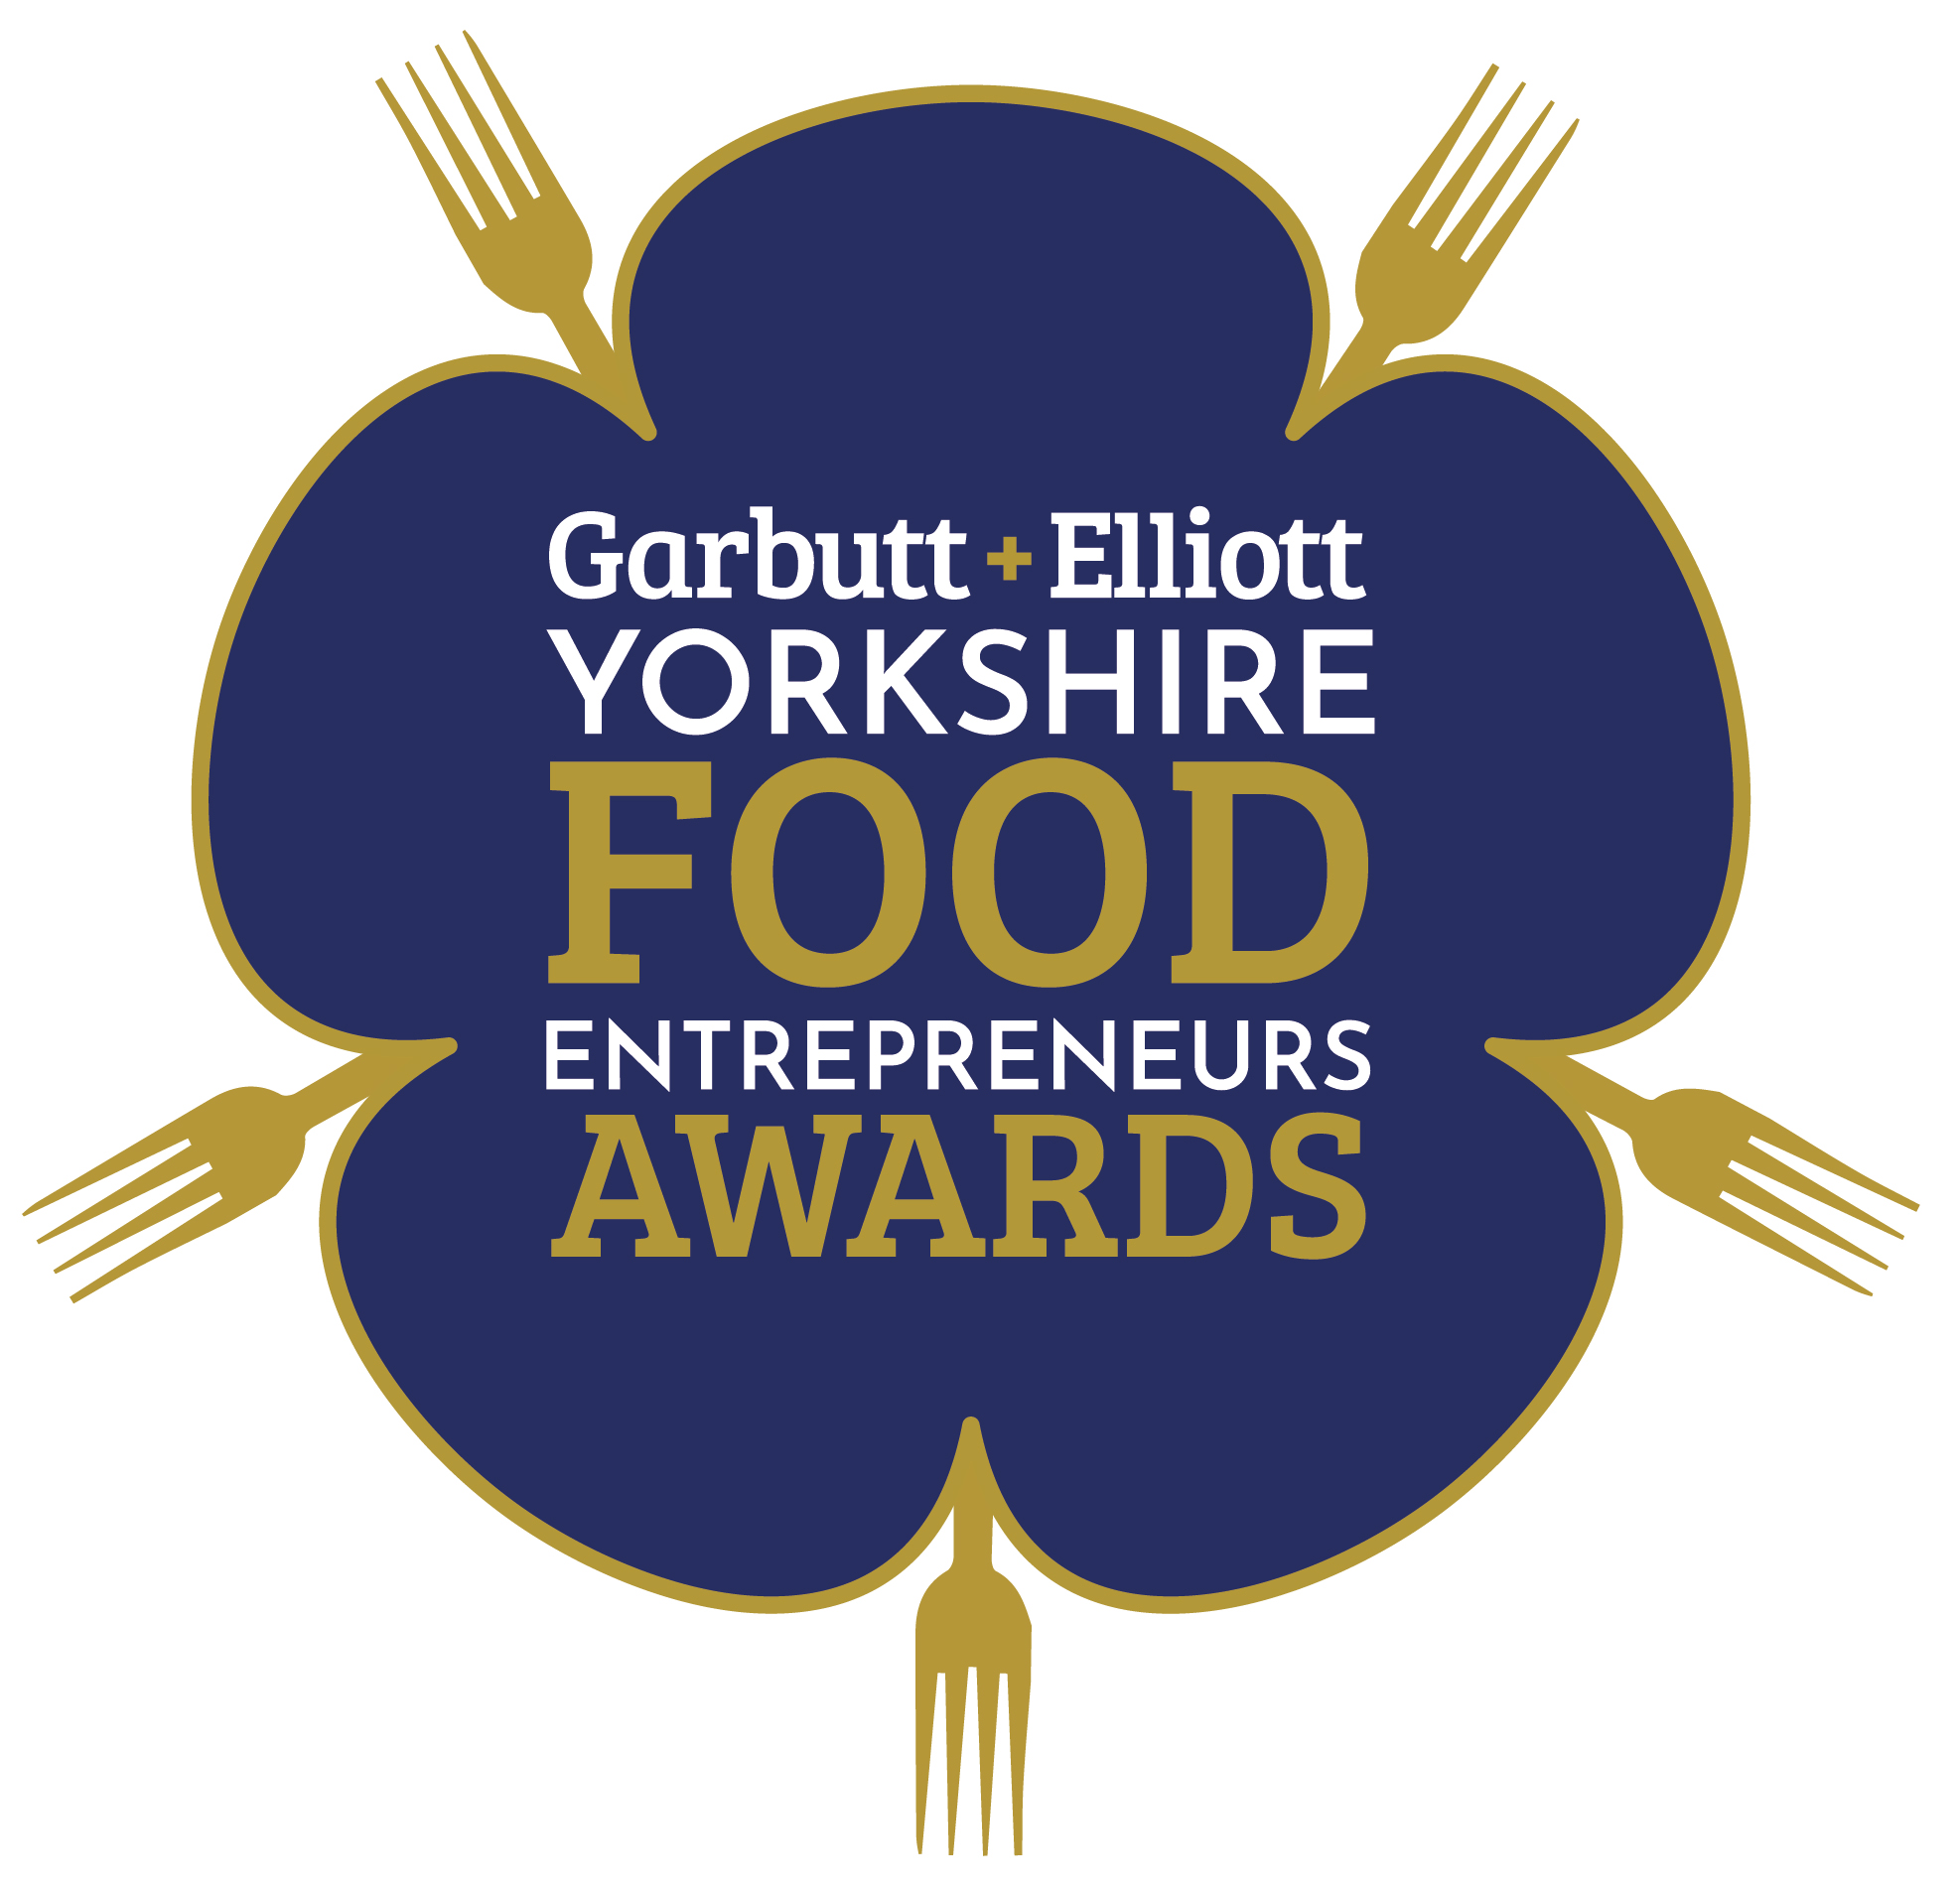 Garbutt + Elliott launch second annual food entrepreneurs awards